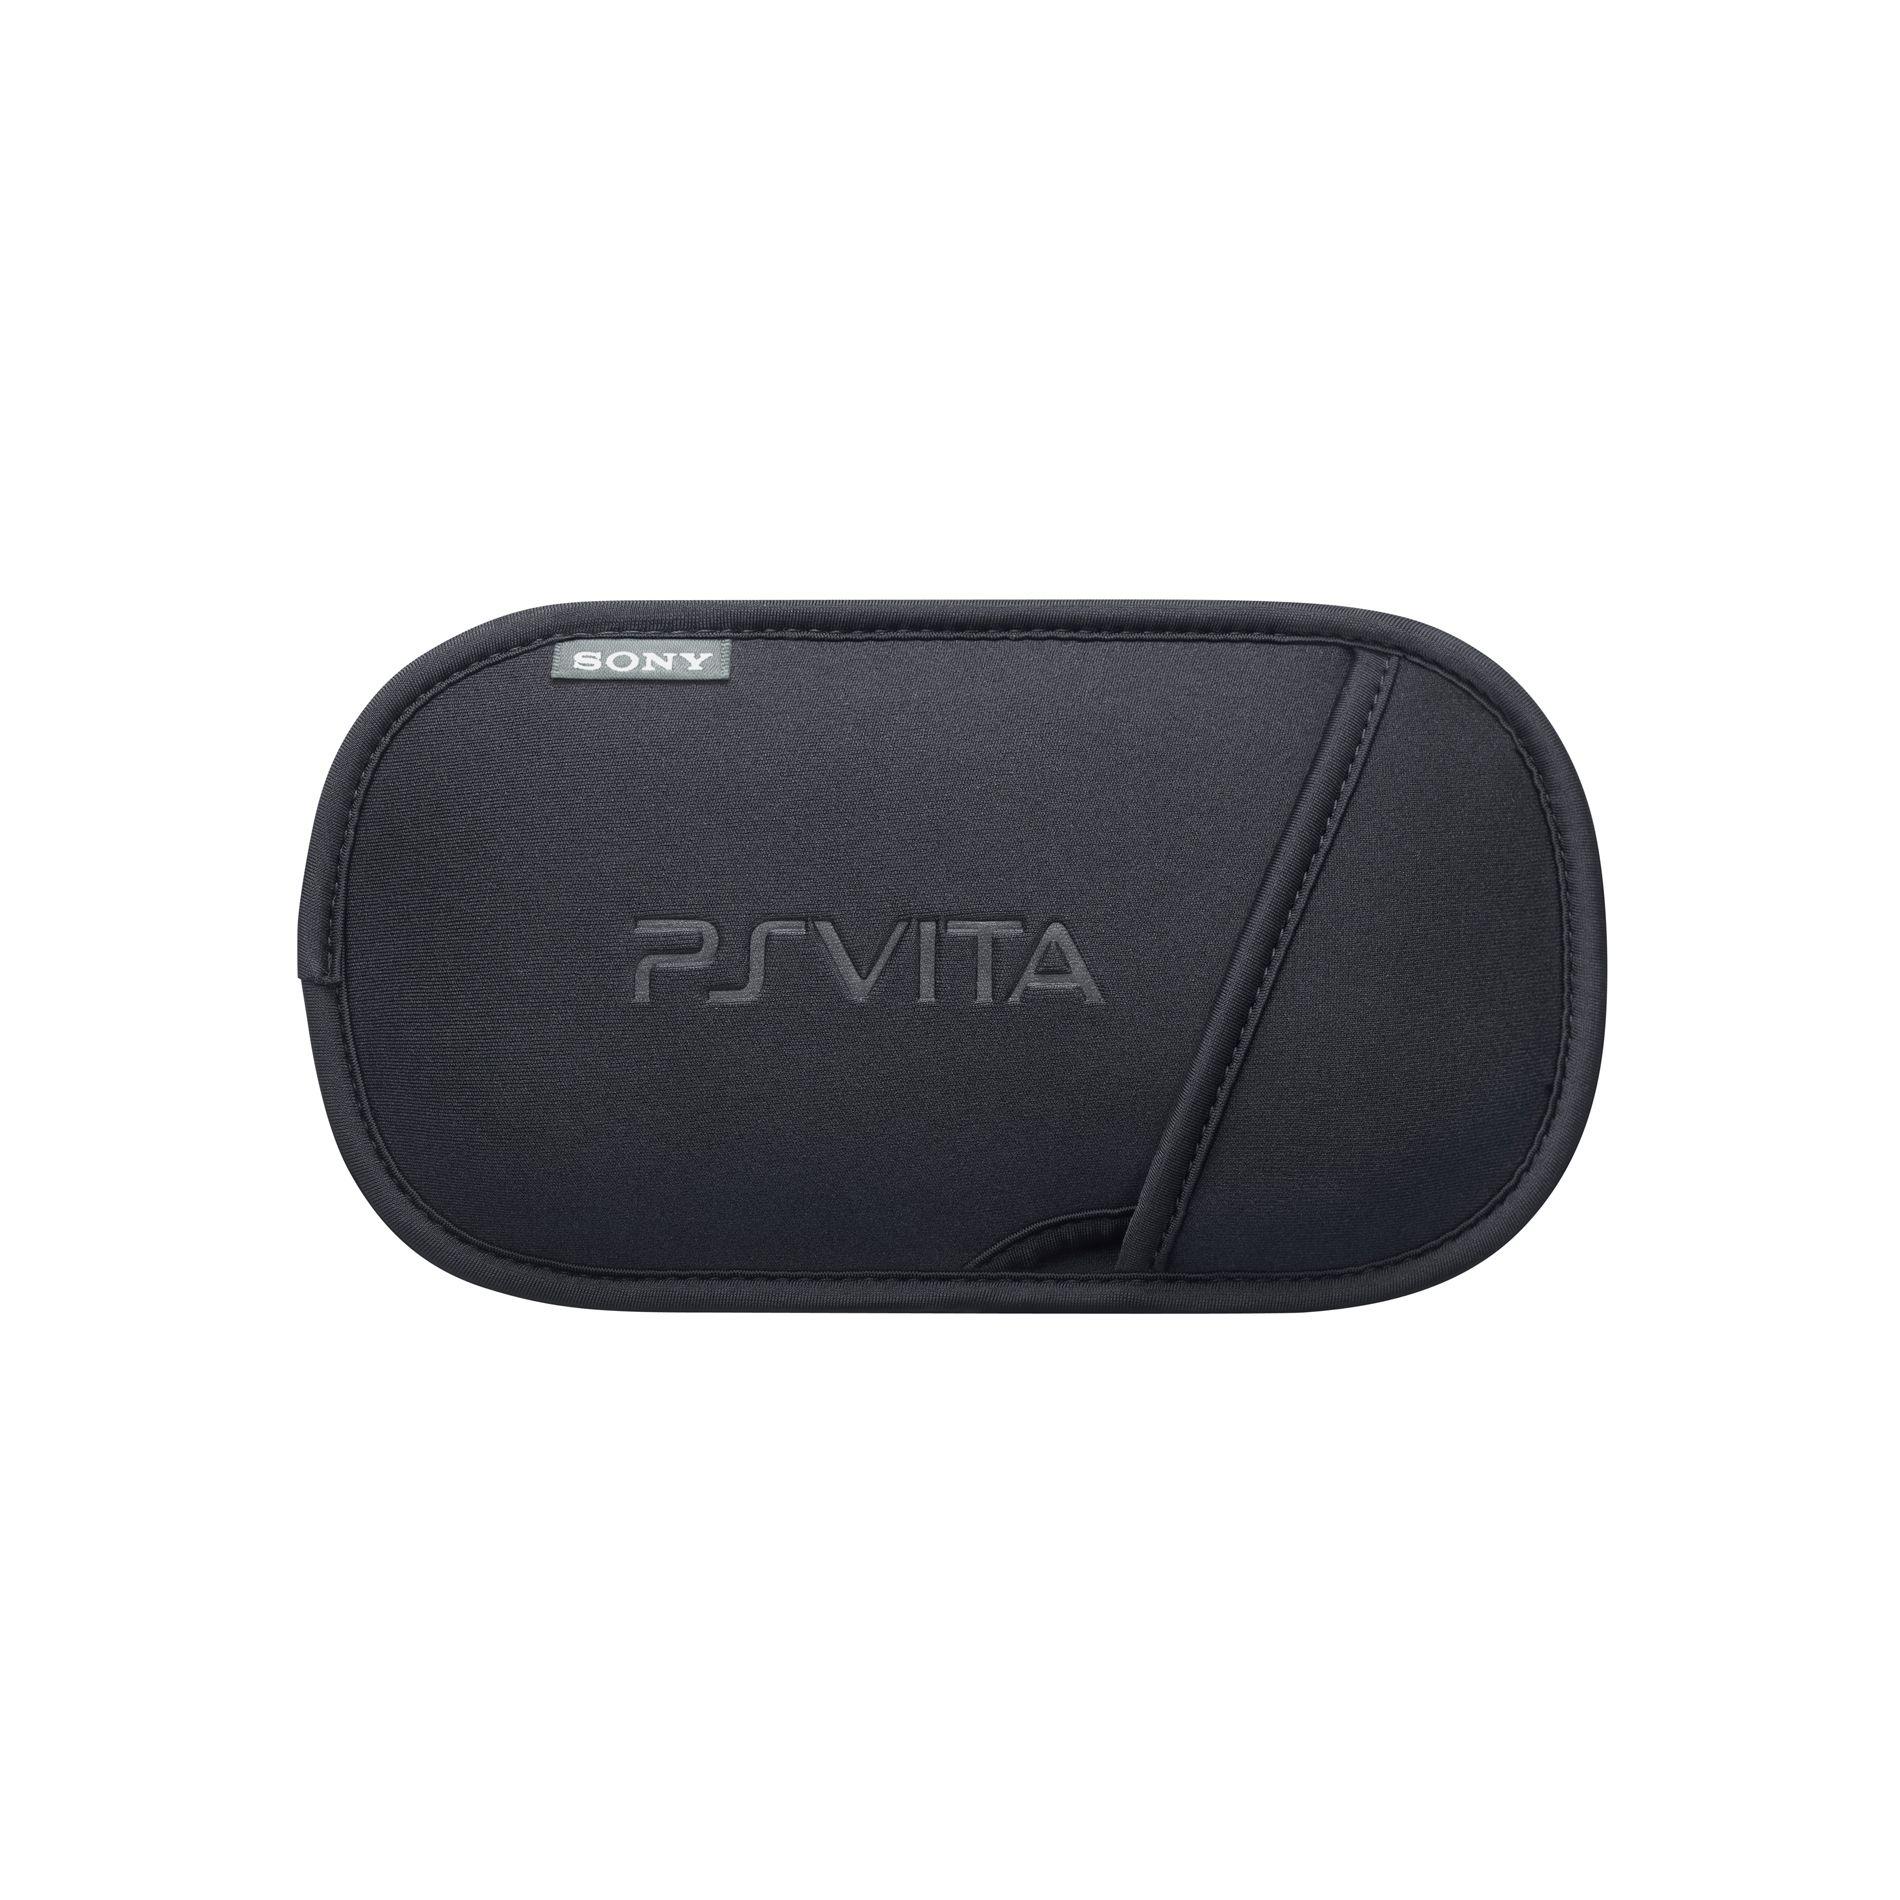 Sony PlayStation®Vita Starter Kit w/ Memory Card